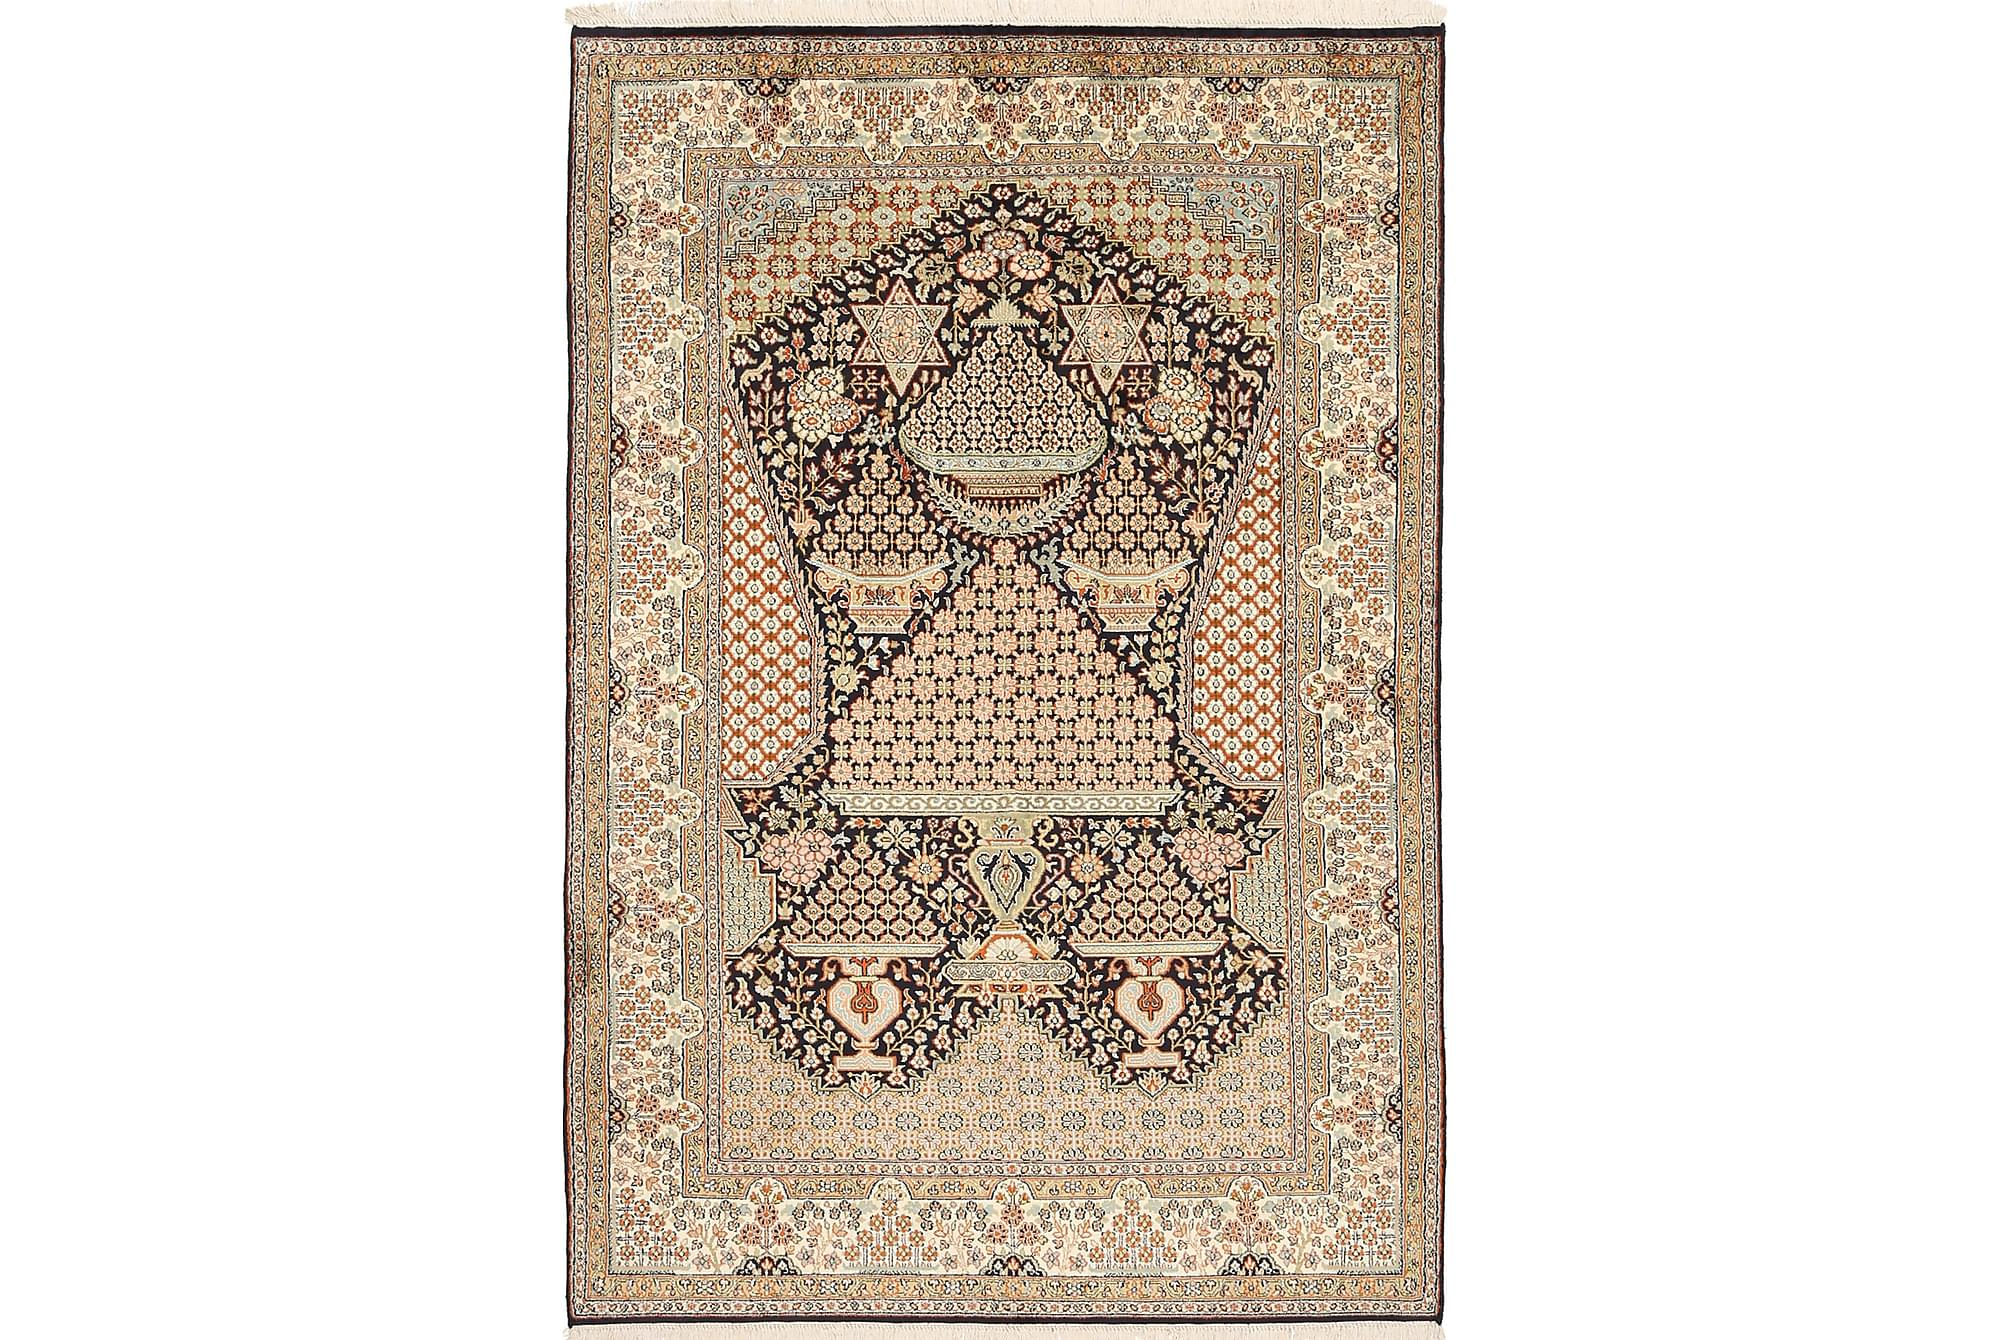 ORIENTALISK Silkesmatta Kashmir 123x182, Äkta silkesmattor